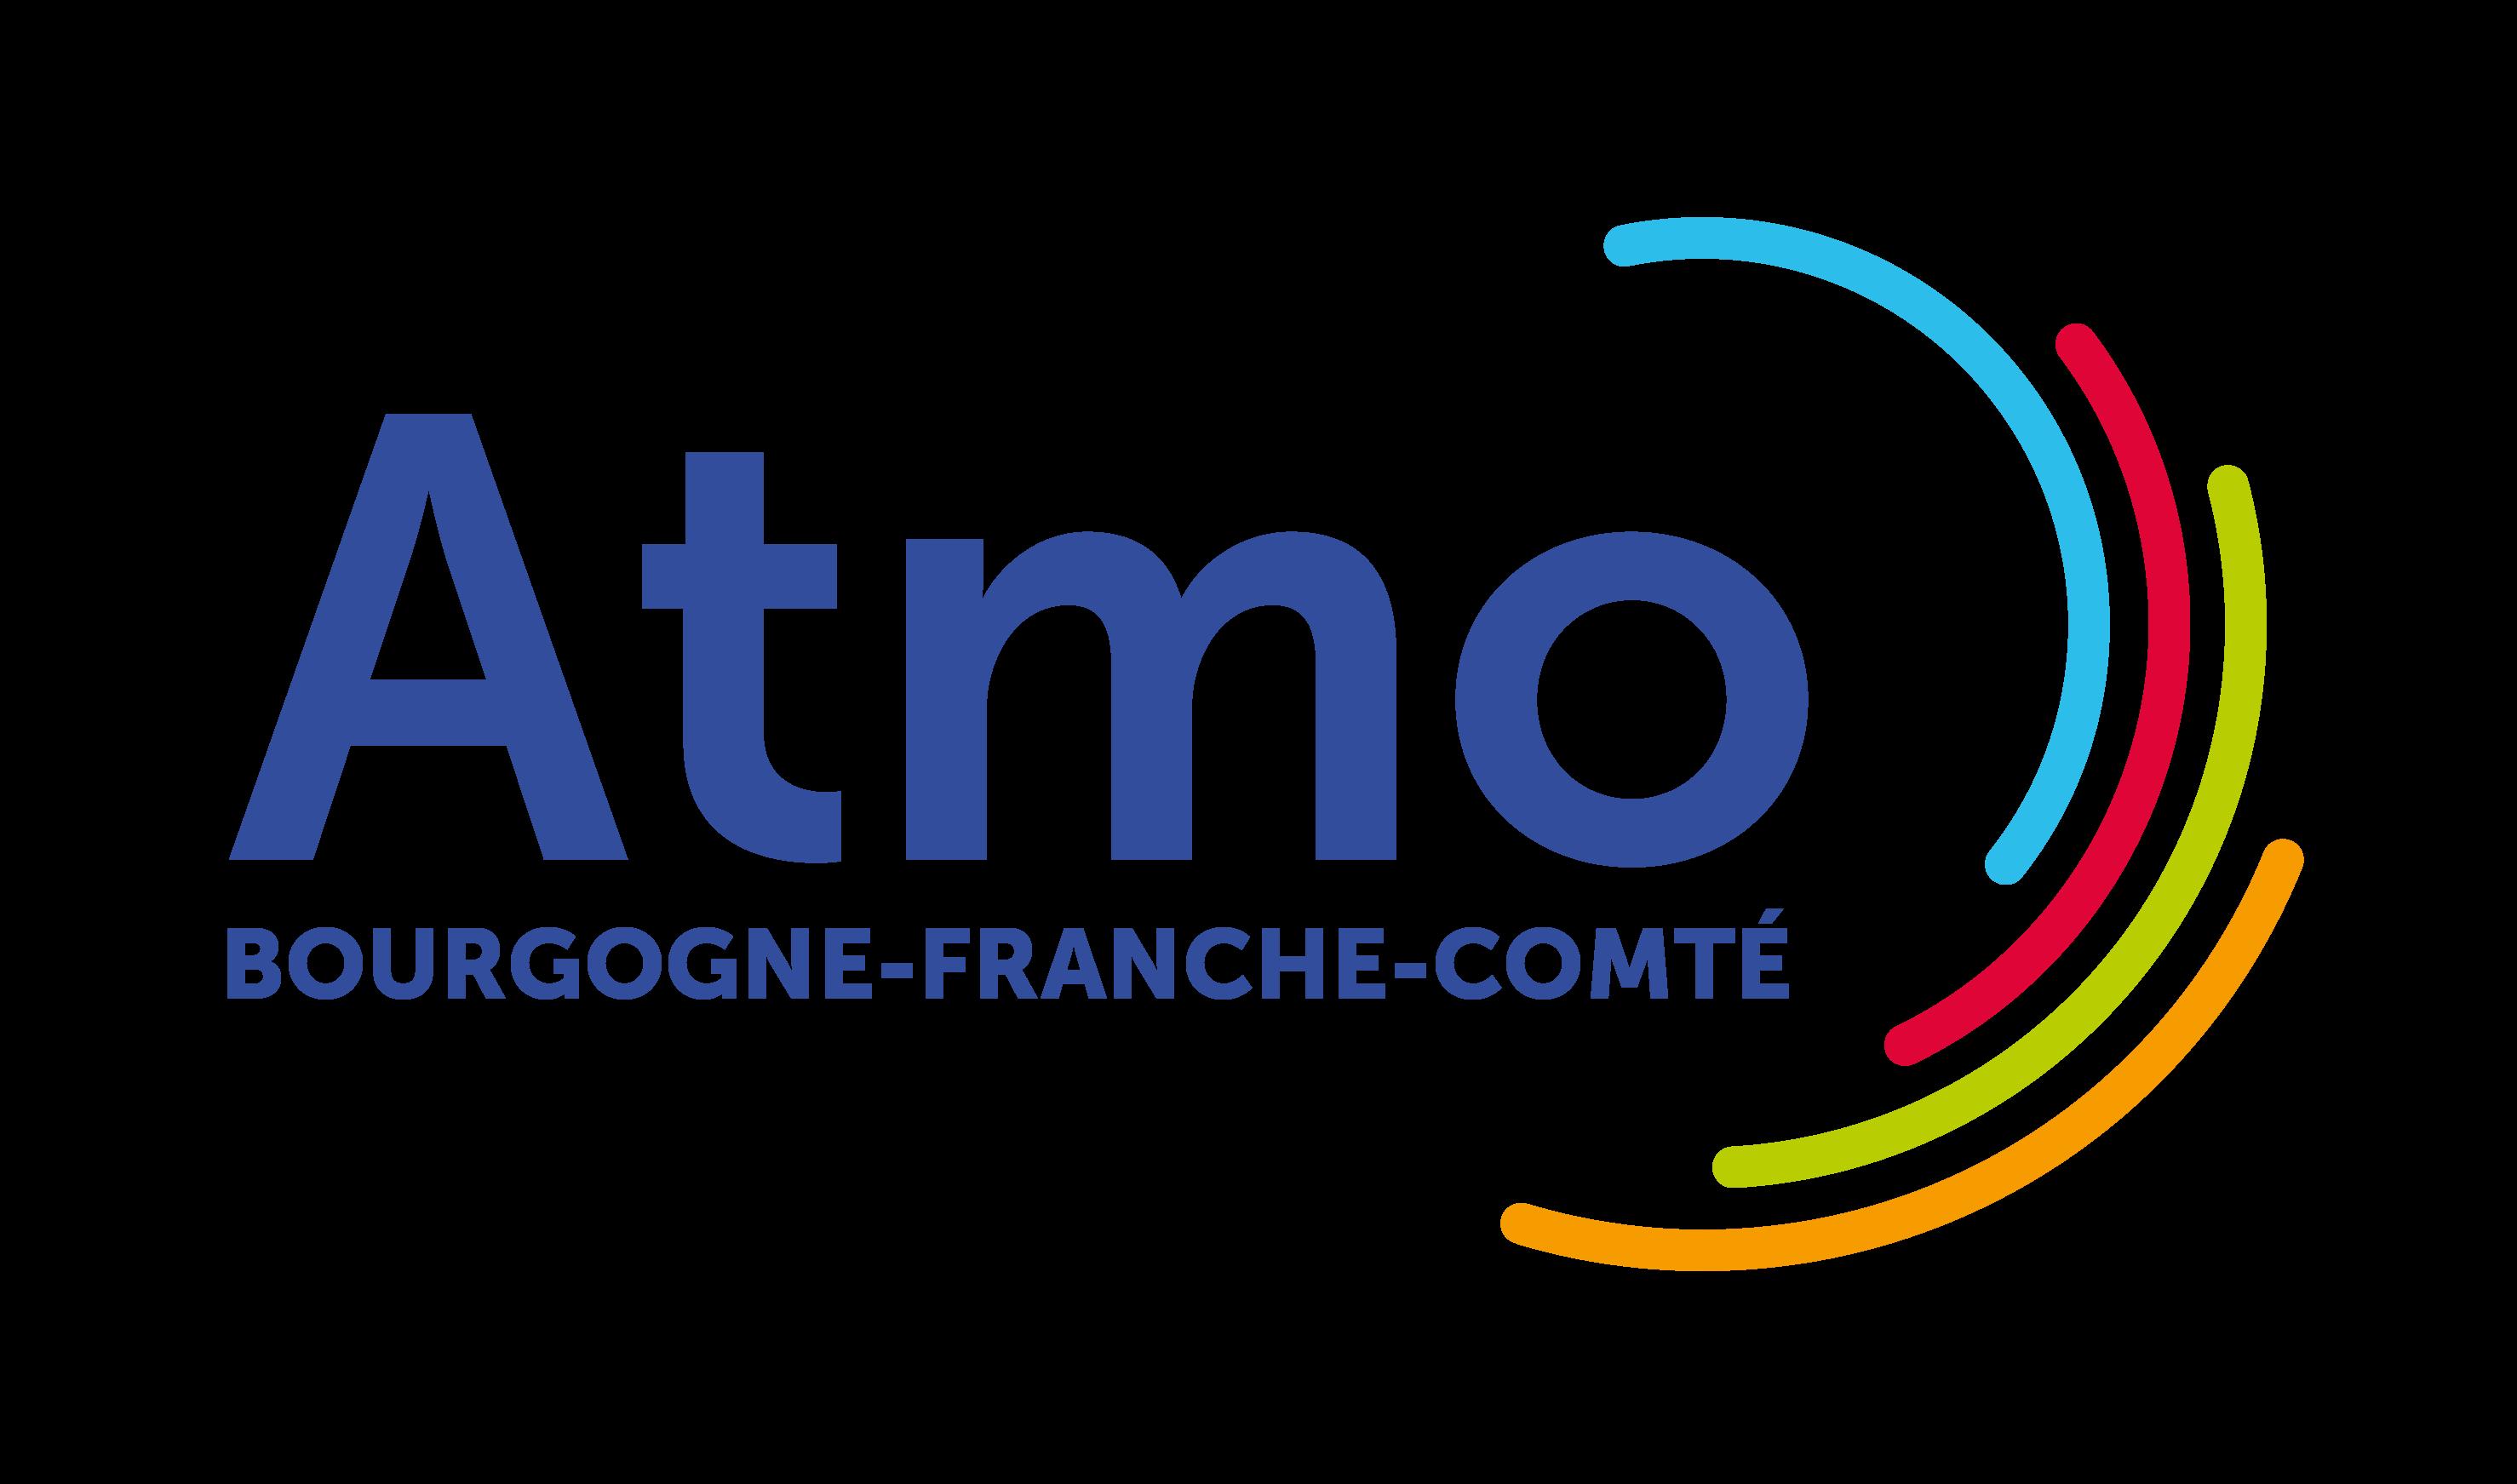 Atmo Bourgogne Franche Comté